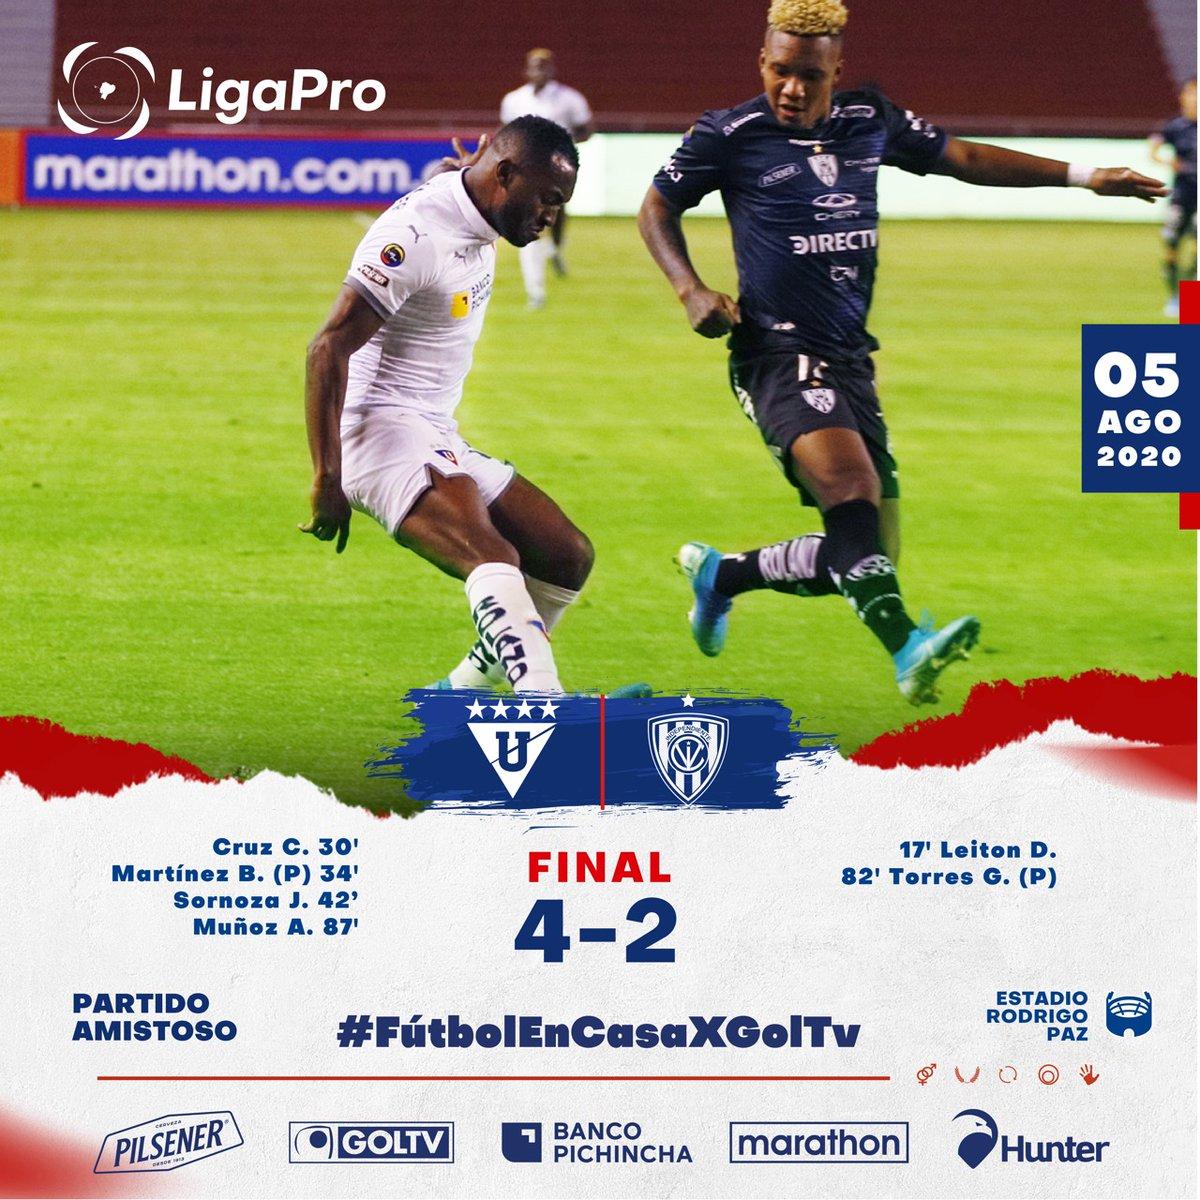 ¡Marcador Final!  #LigaPro   Amistoso ⠀   Estadio Rodrigo Paz Delgado ⠀ #LDU #IDV (-)⠀  Goles: #LDU: Cruz (30'), Martínez (34') -P, Sornoza (42'), Muñoz (87') #IDV: Leiton (17'), Torres (81') - P ⠀  #LigaPro  #GanamosTodos #LDU #IDVpic.twitter.com/8WNIGE5WkX